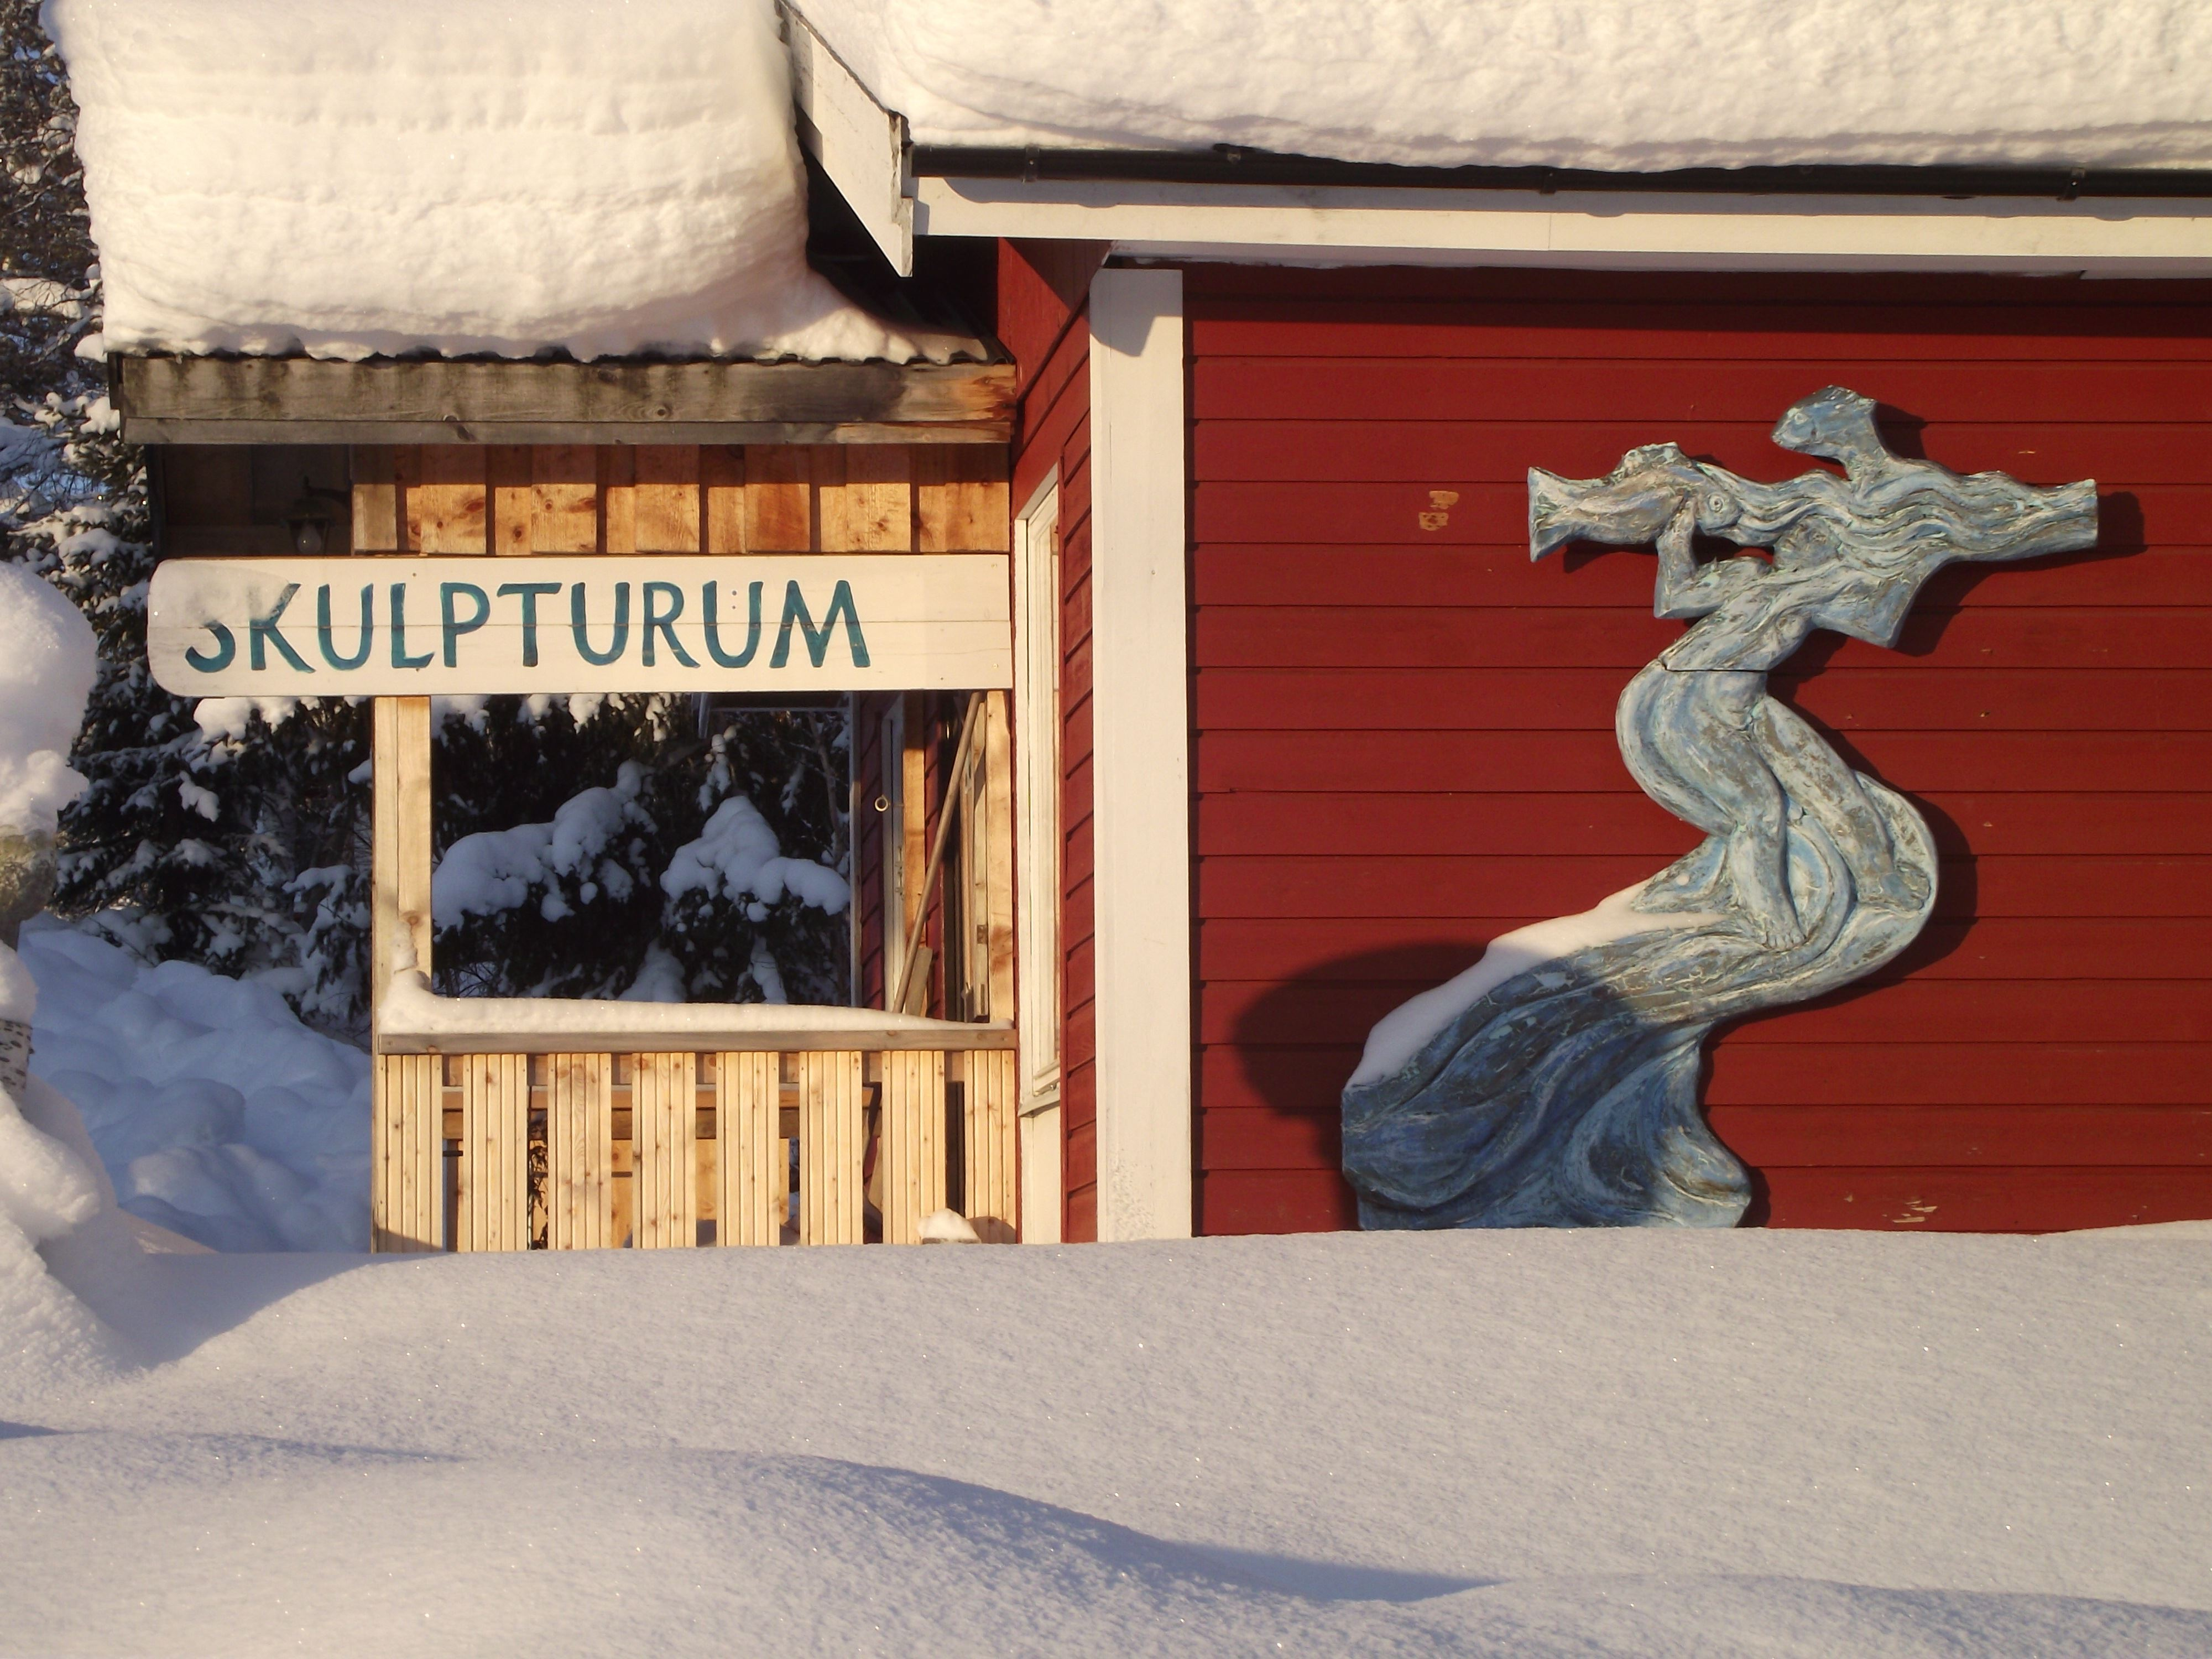 Foto: Urban Berglund, Skulpturum Art Studio